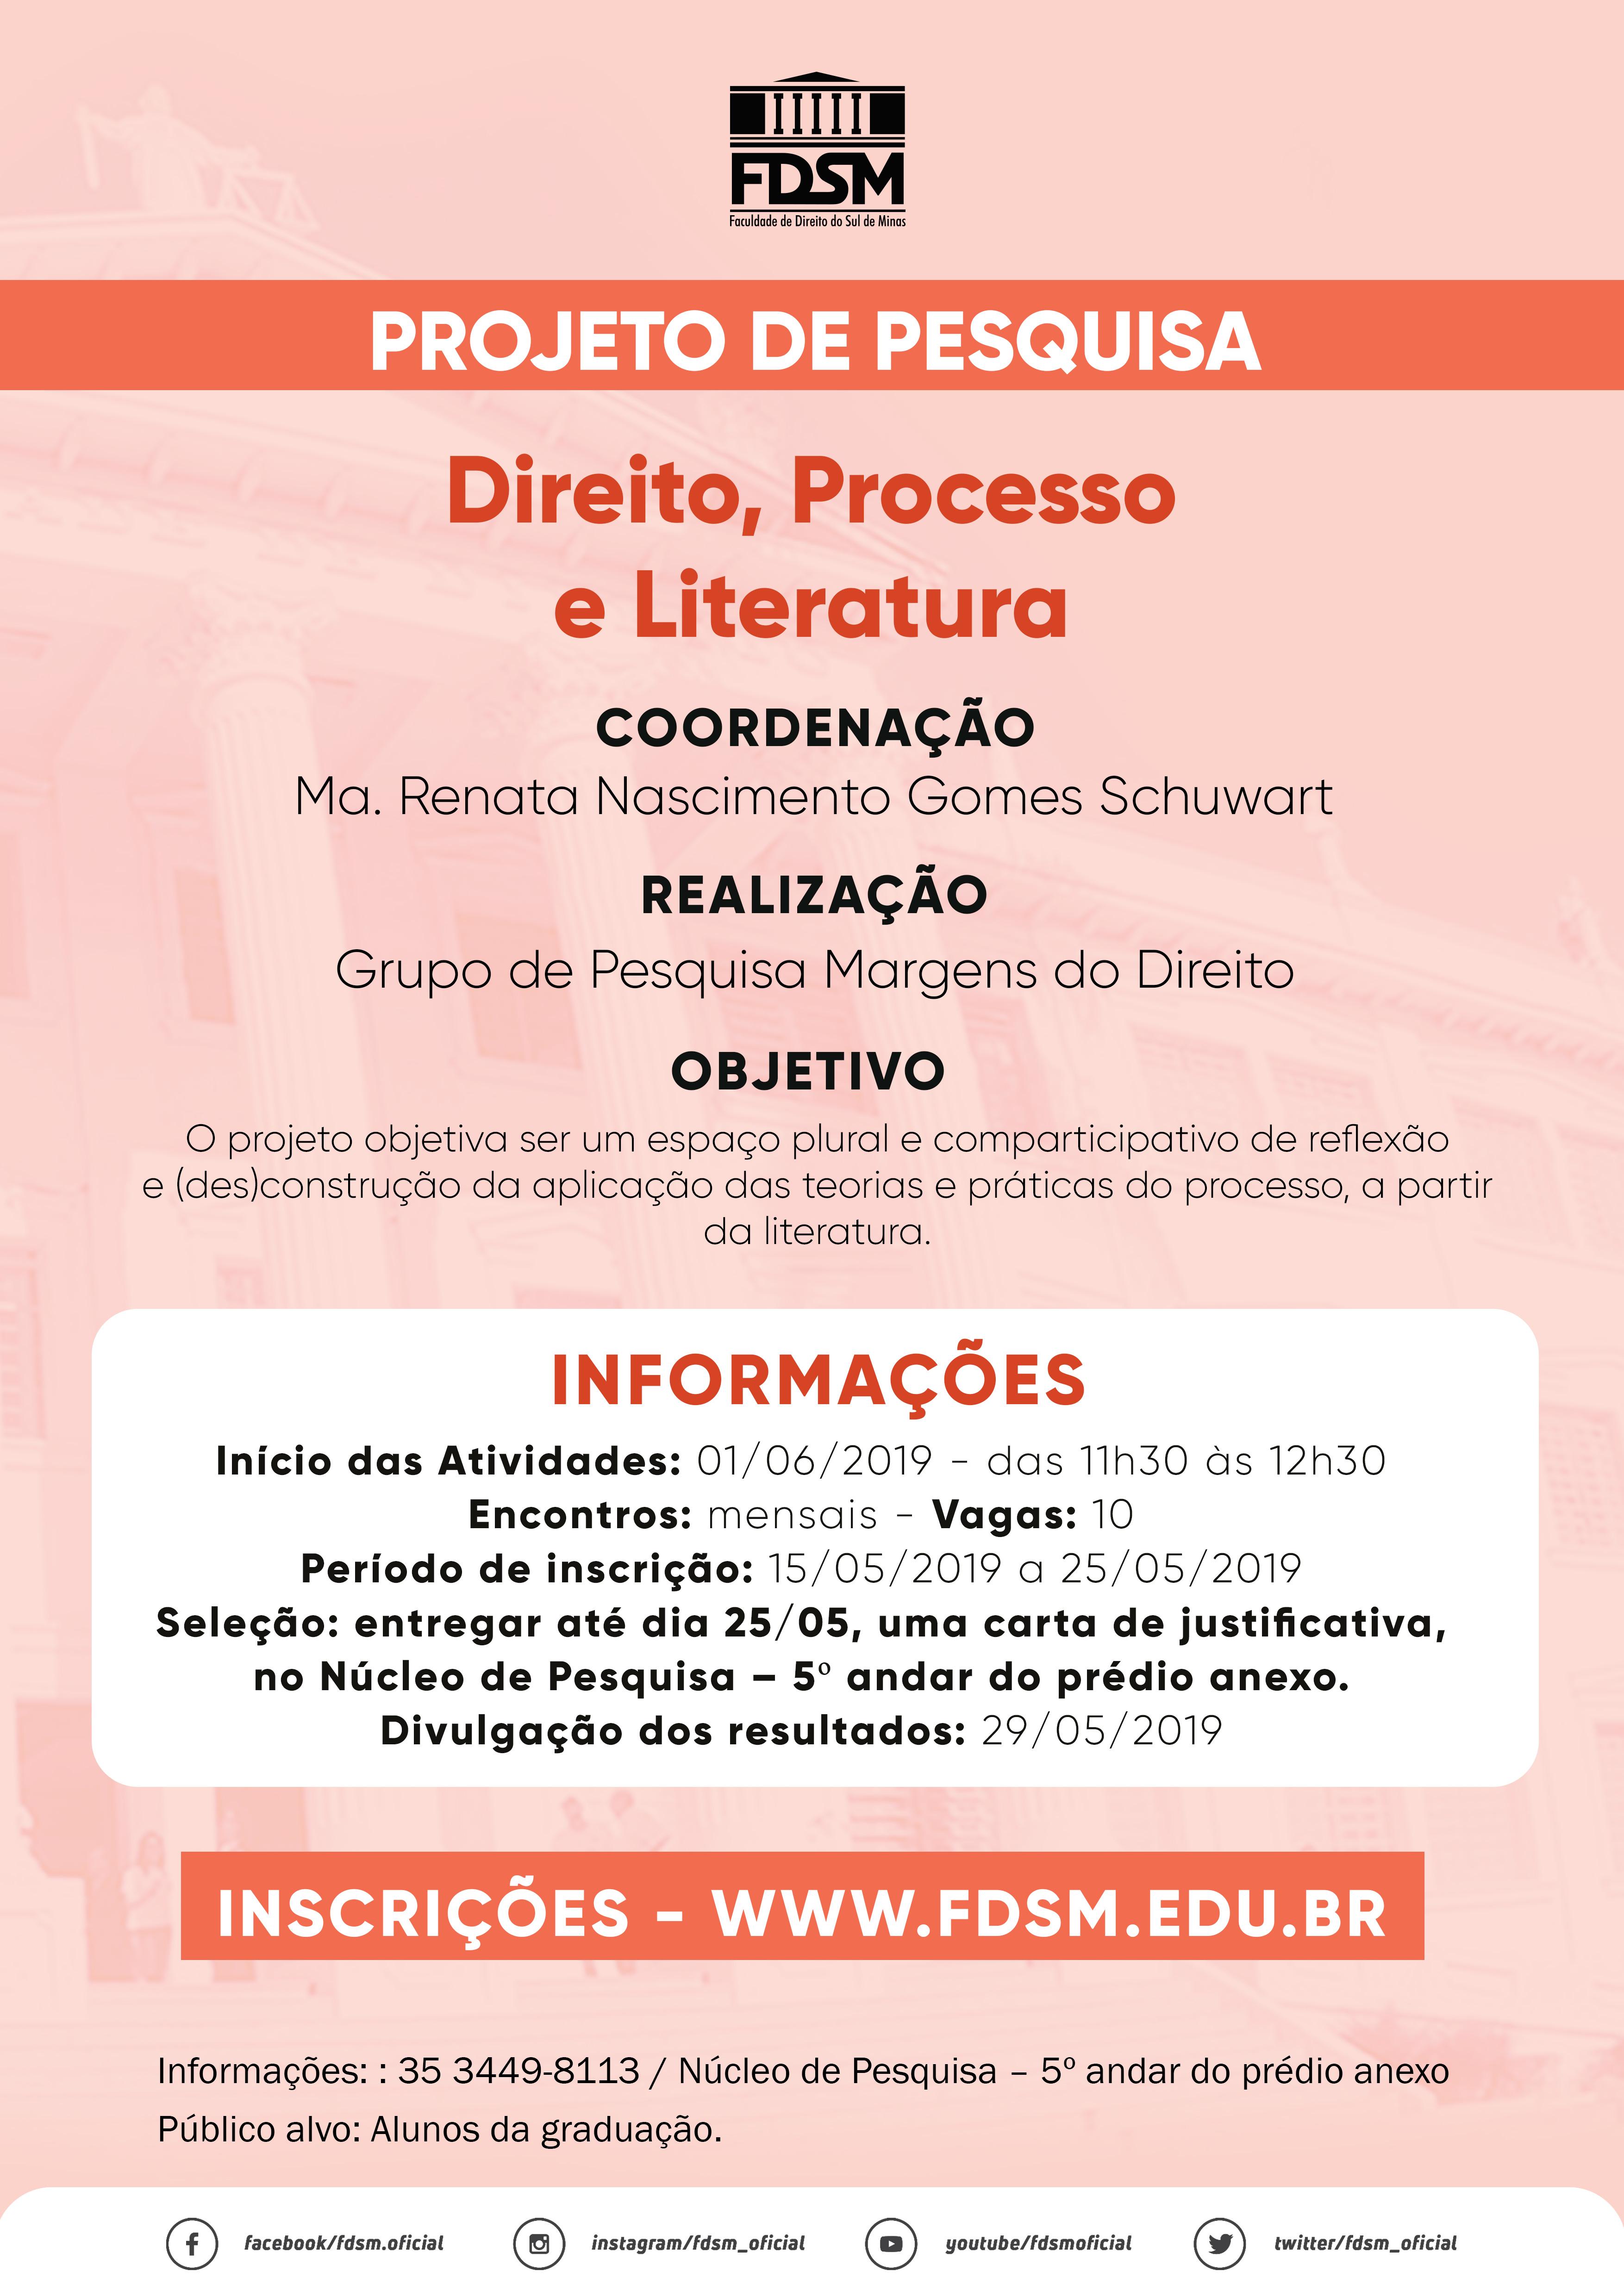 Projeto de Pesquisa - Direito, Processo e Literatura